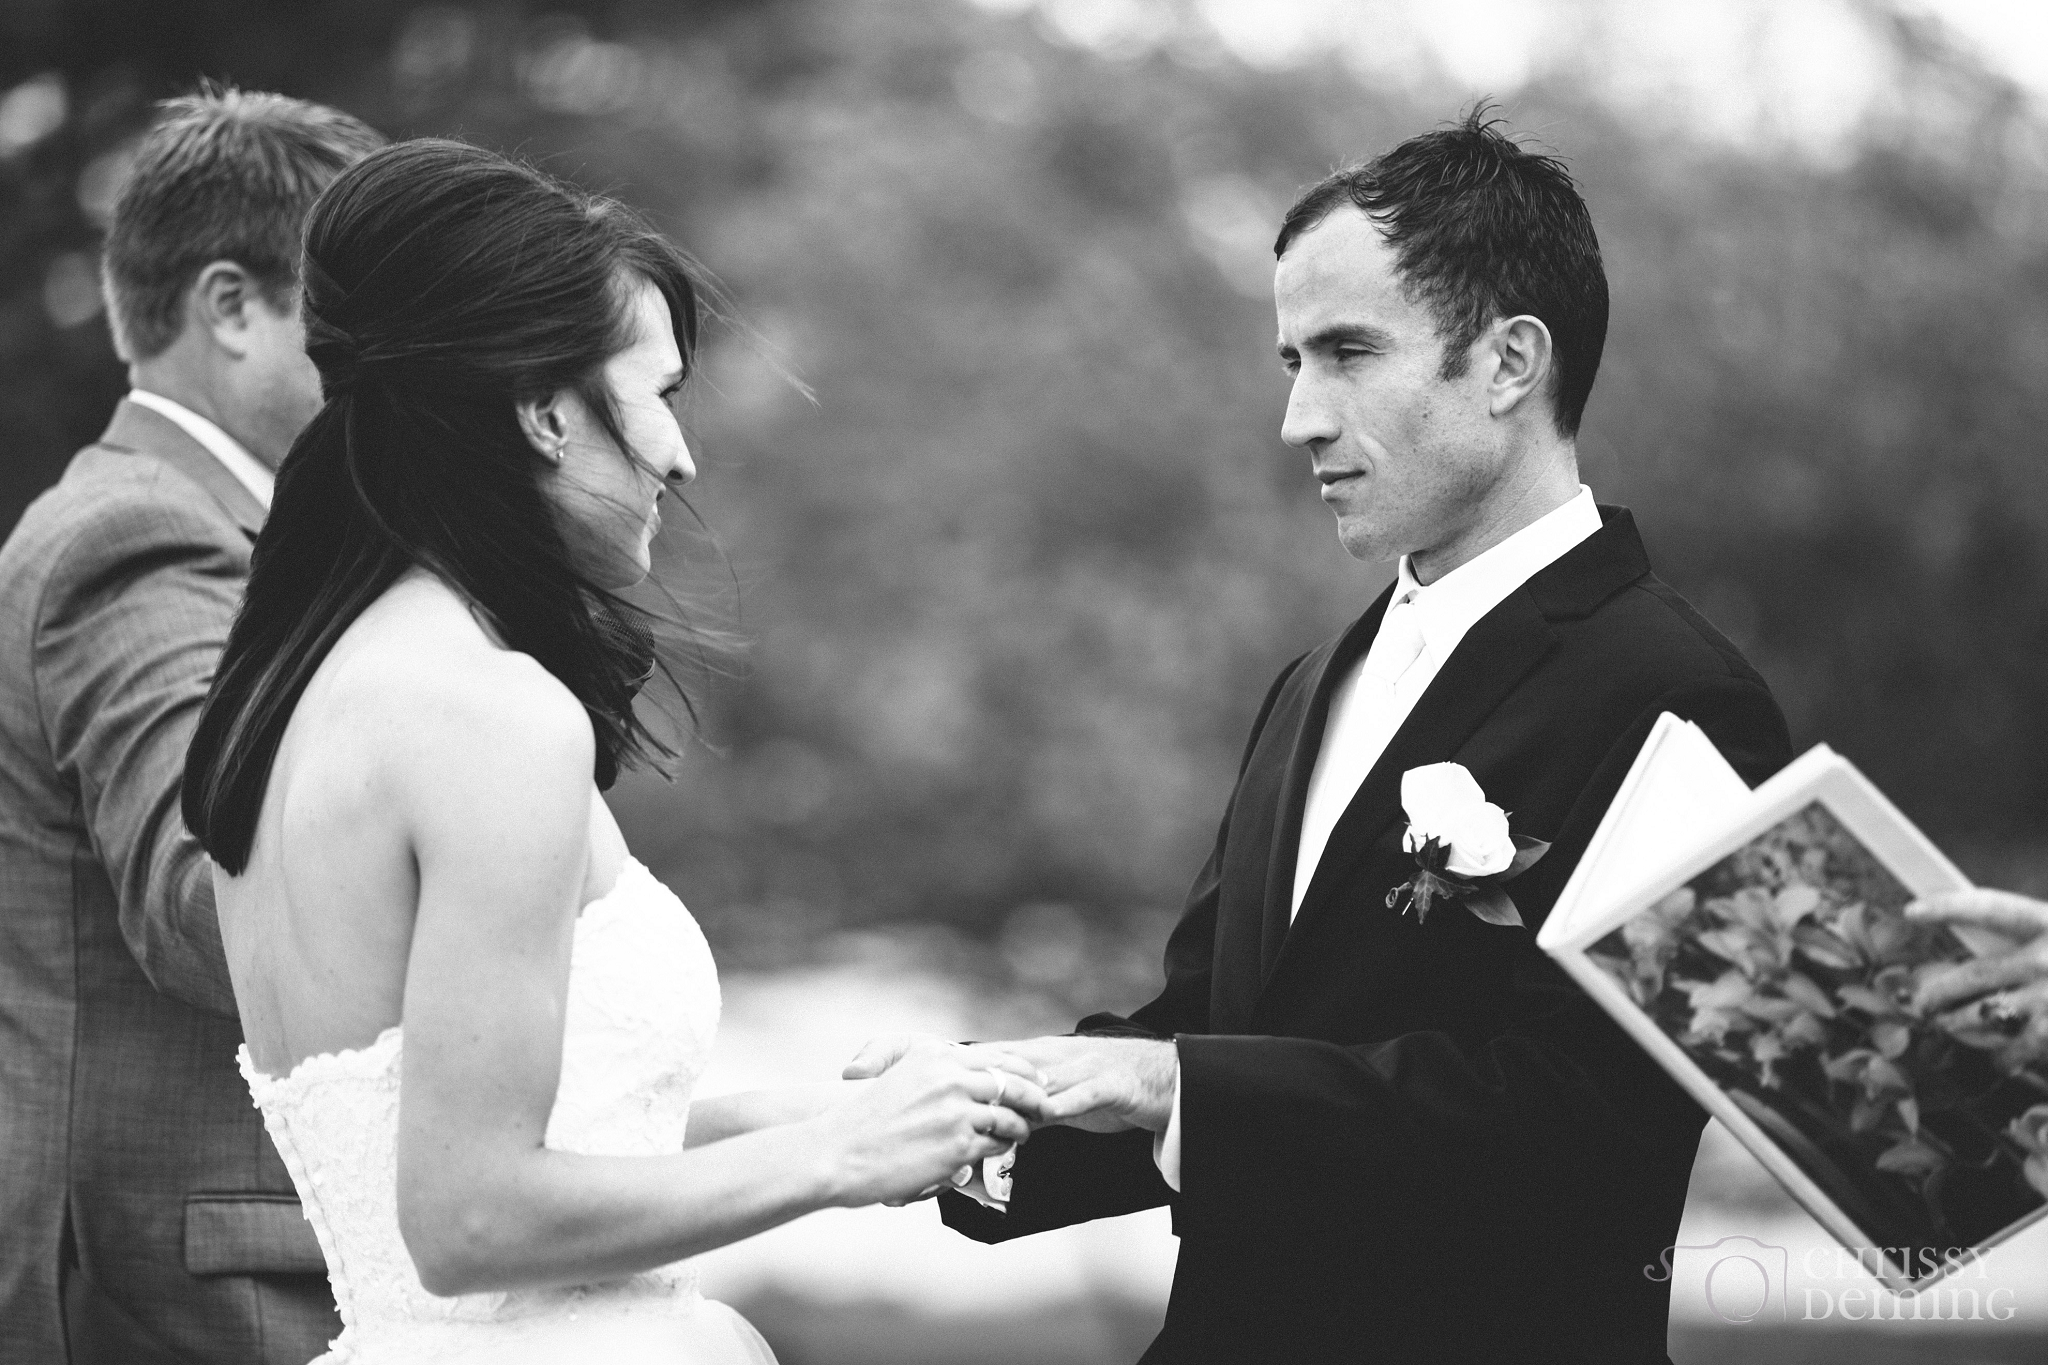 promontory_point_chicago_wedding_photography_0016.jpg